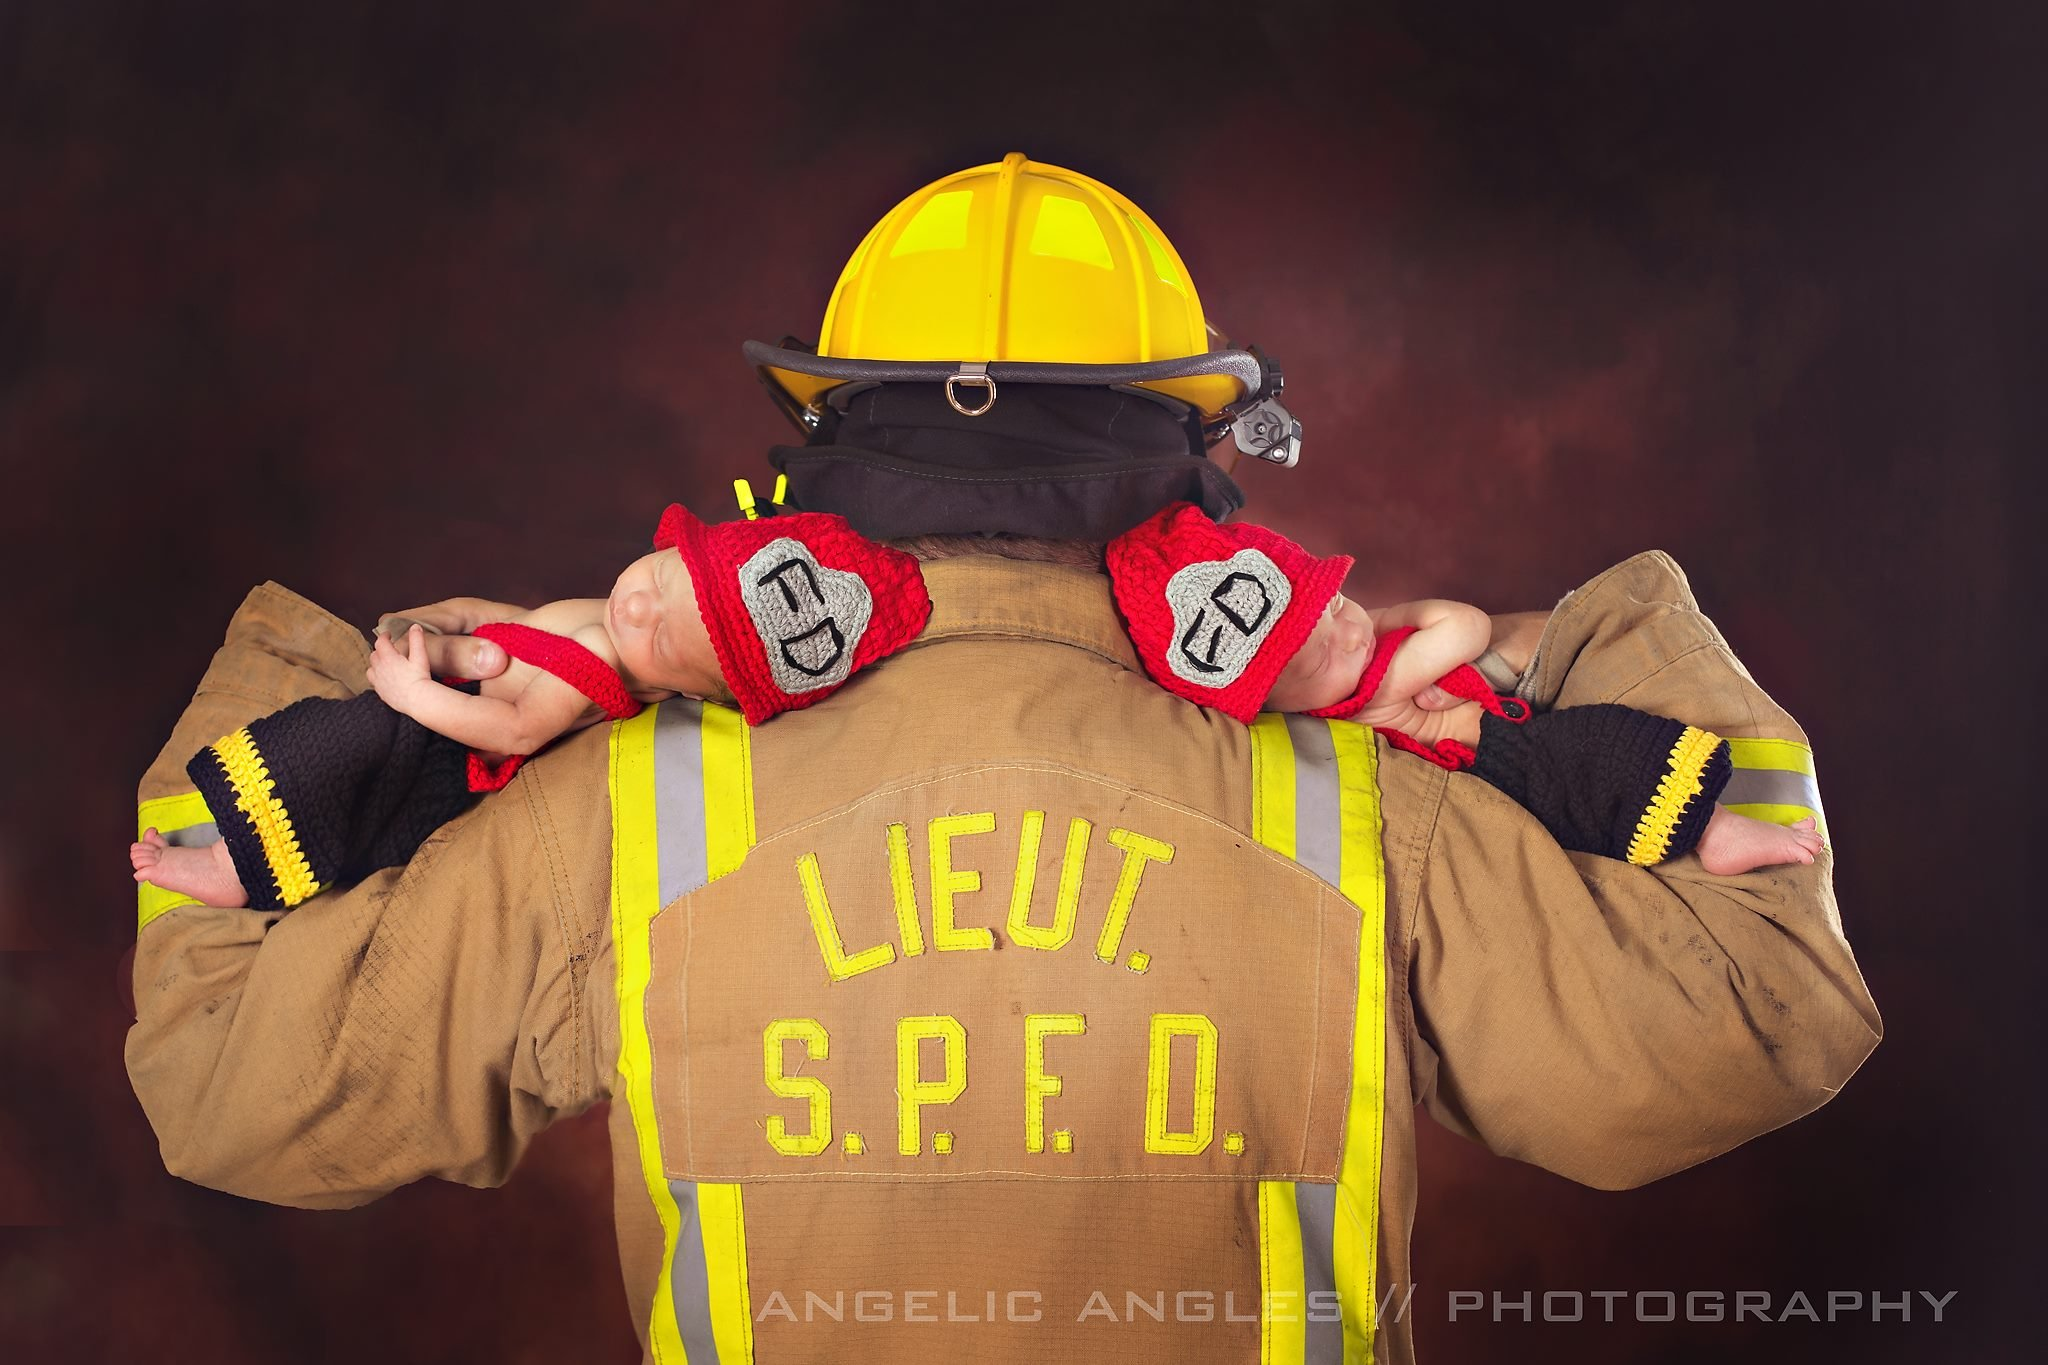 Photo courtesy Jennifer Anderson/Angelic Angles Studio